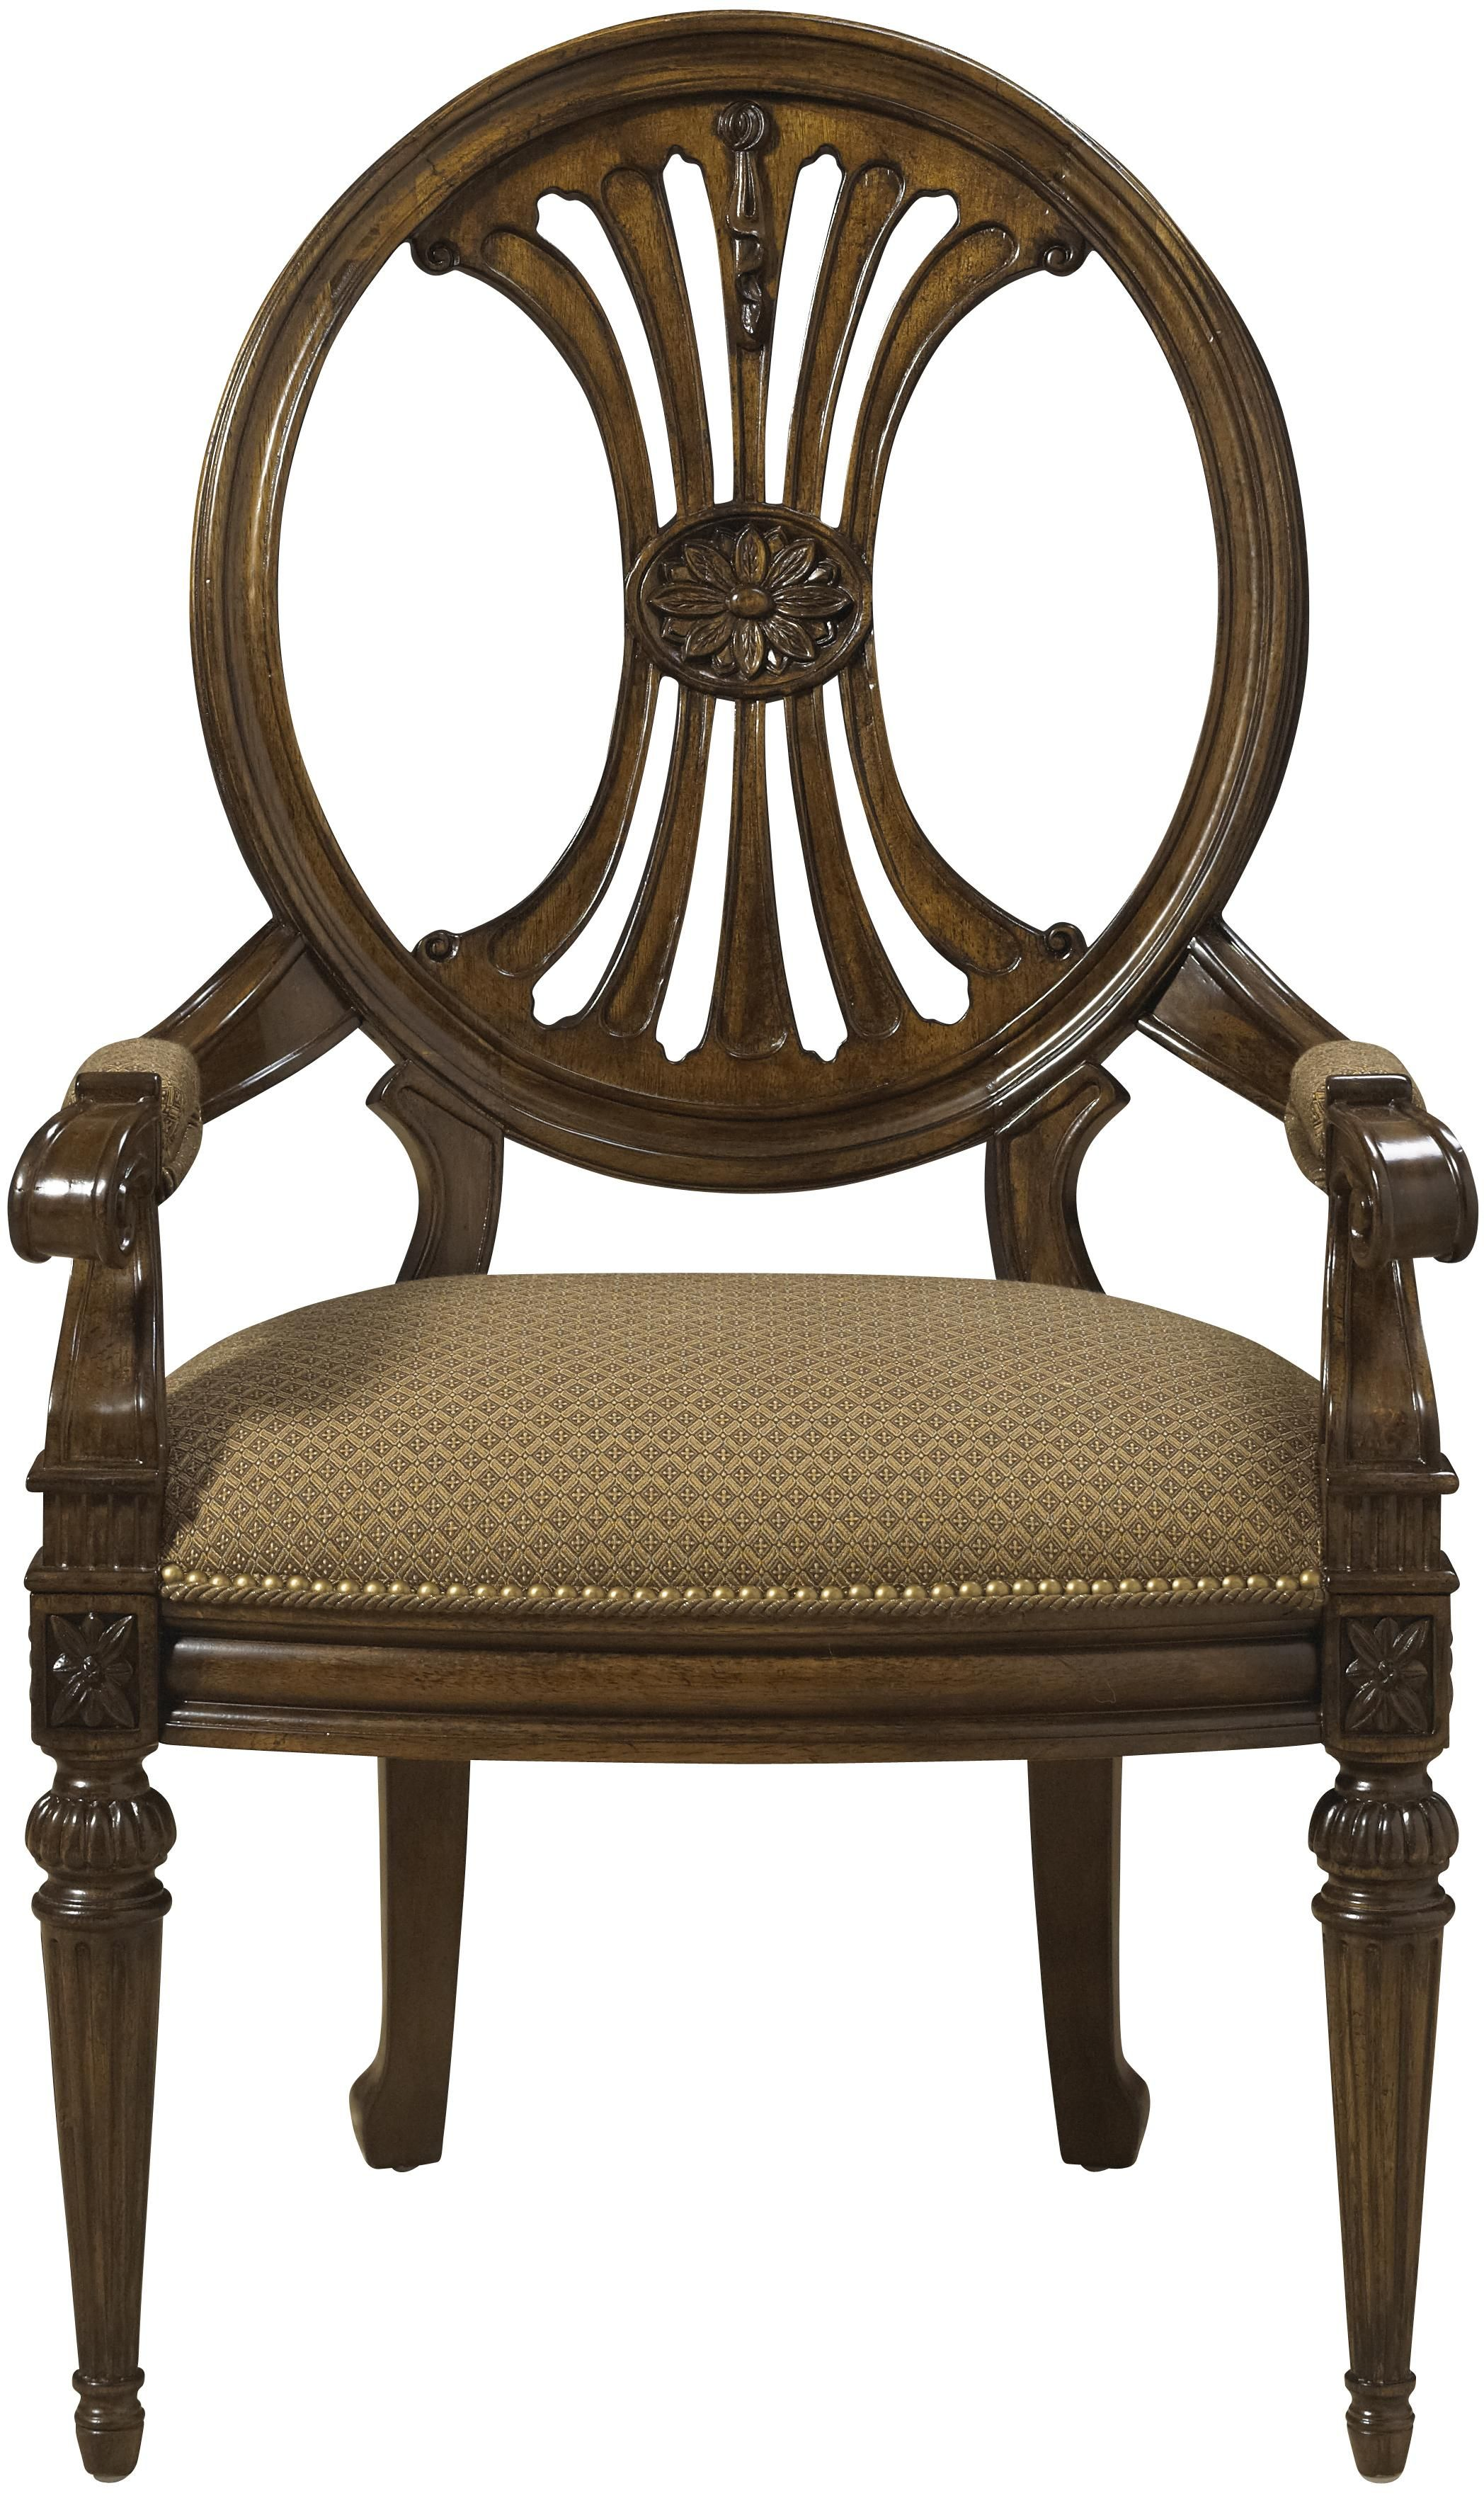 Marvelous Antique Furniture · Armchair: Classic Armchair Styles